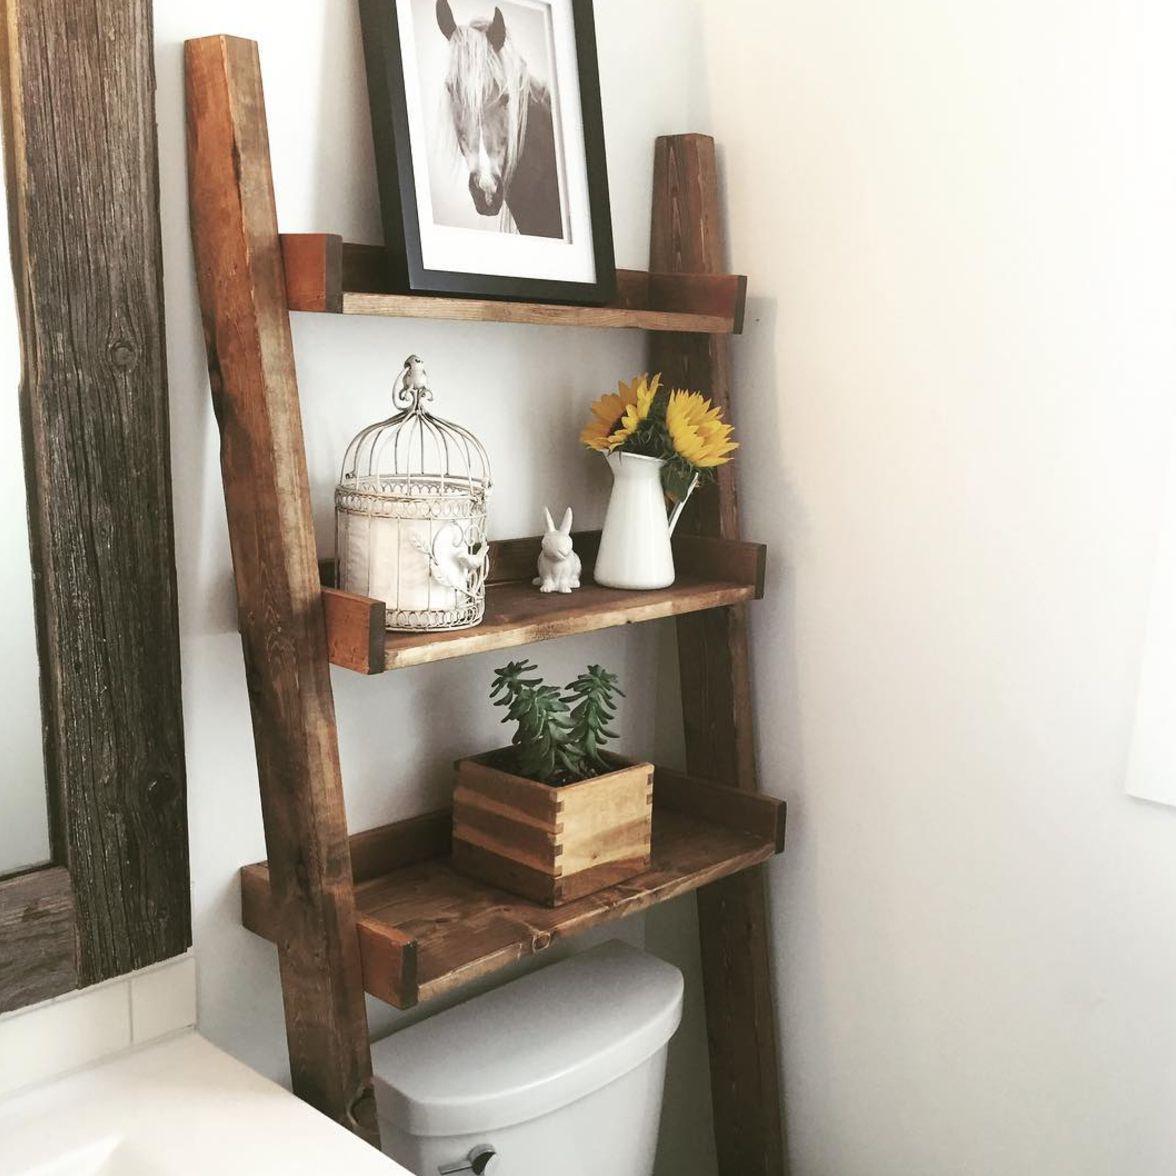 17 Small Bathroom Shelf Ideas, Wood Shelves Bathroom